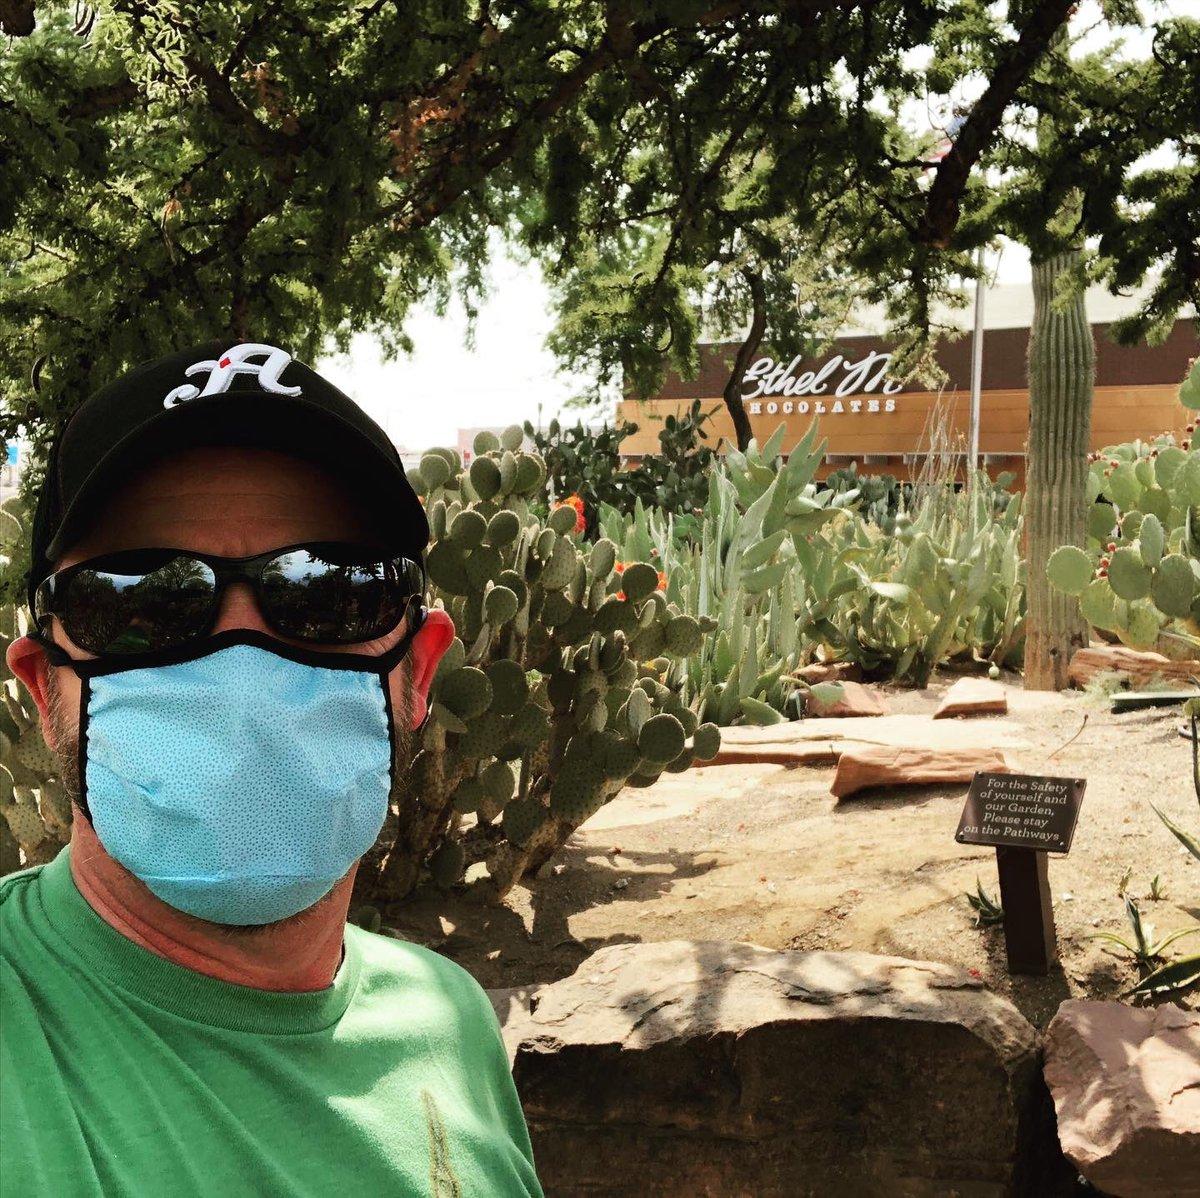 Chocolate and a Cactus garden. It's great to be in town. #marschocolate #lasvegas @EthelMChocolate #deweysworld https://t.co/z46SEsZgOt